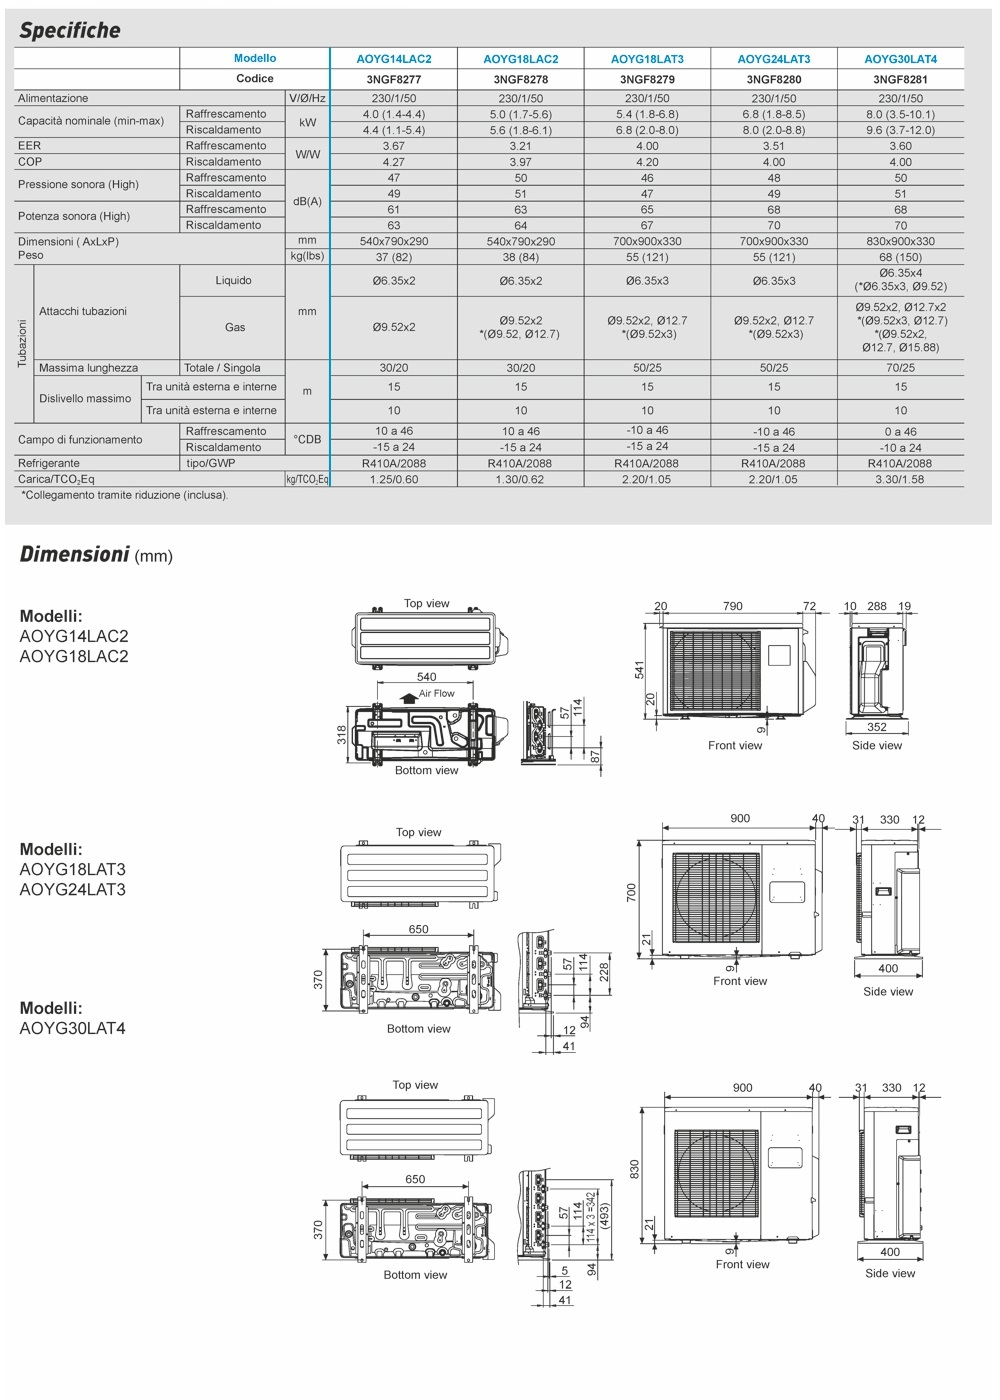 Climatizzatore Fujitsu Quadri Split 9+9+12+12 LM AOYG30LAT4